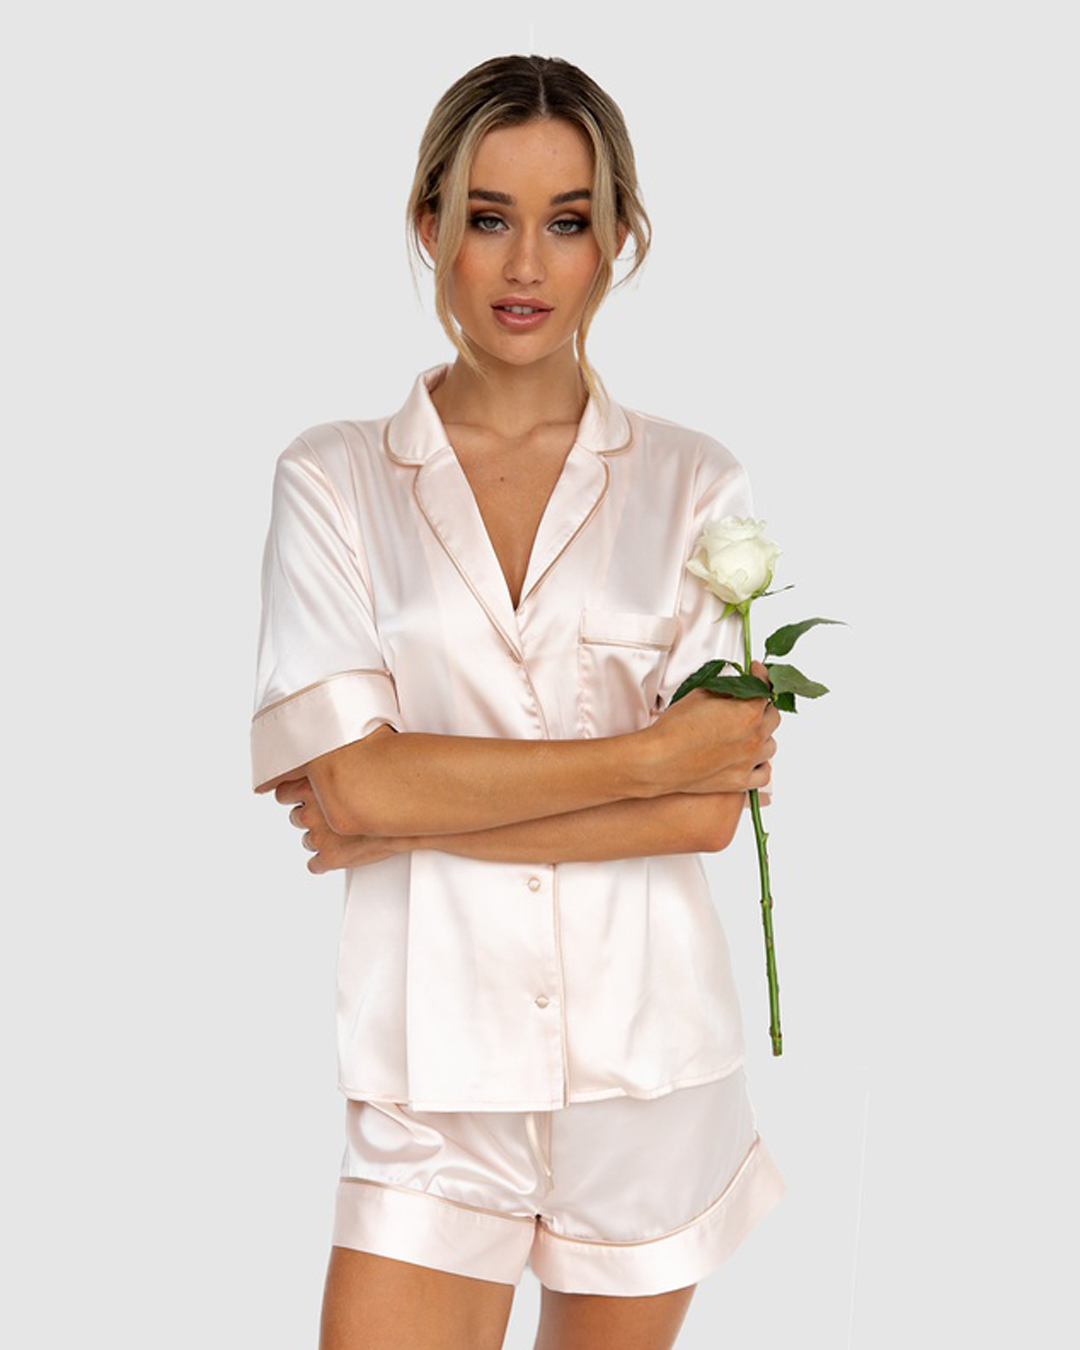 A model wearing pale blush satin pyjamas holding a rose